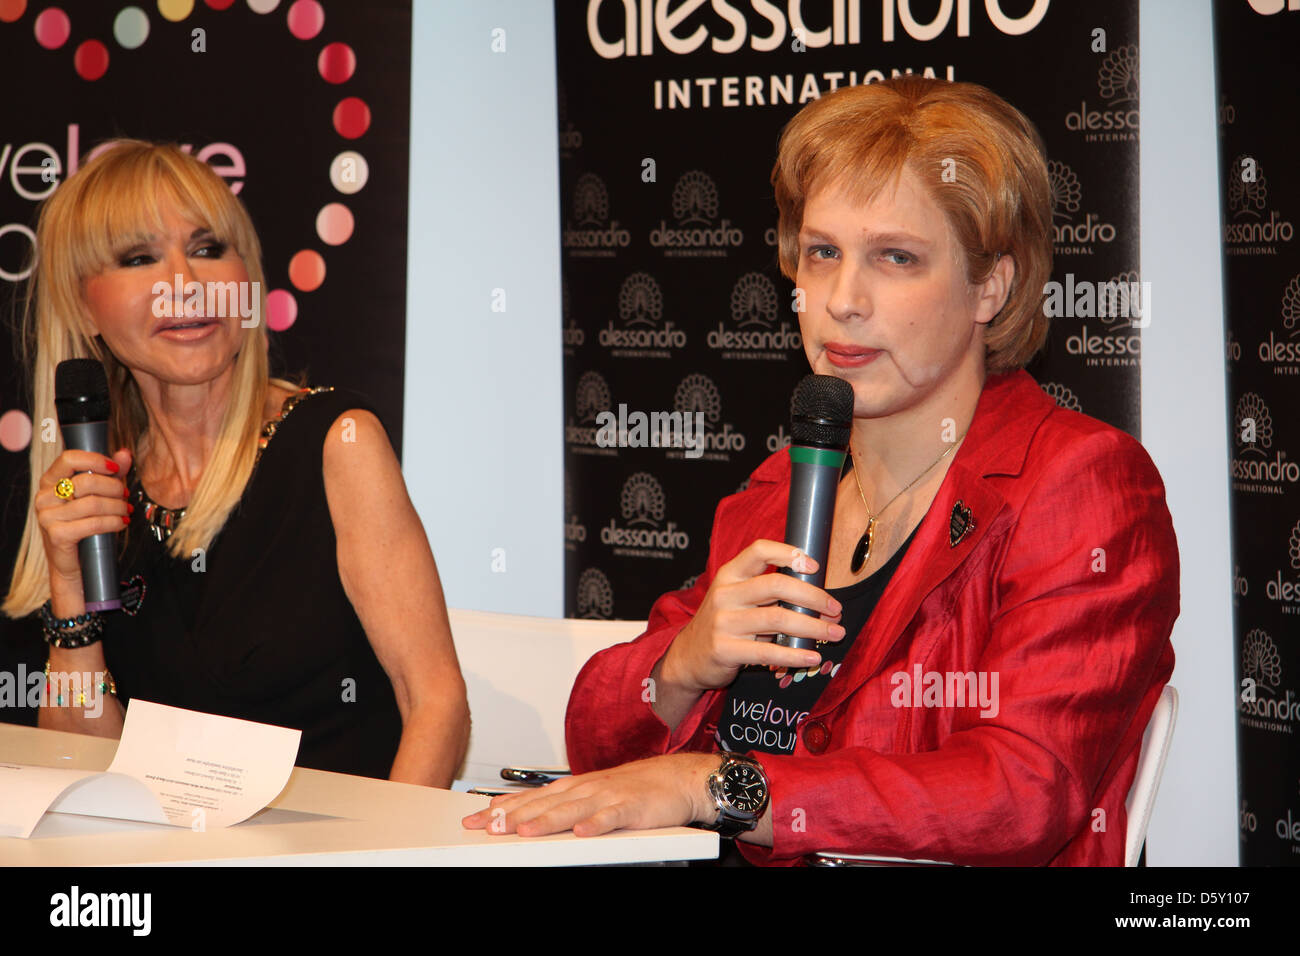 Silvia Troska et Oliver Pocher comme Angela Merkel Salon International de beauté le stand d'Alessandro. Photo Stock